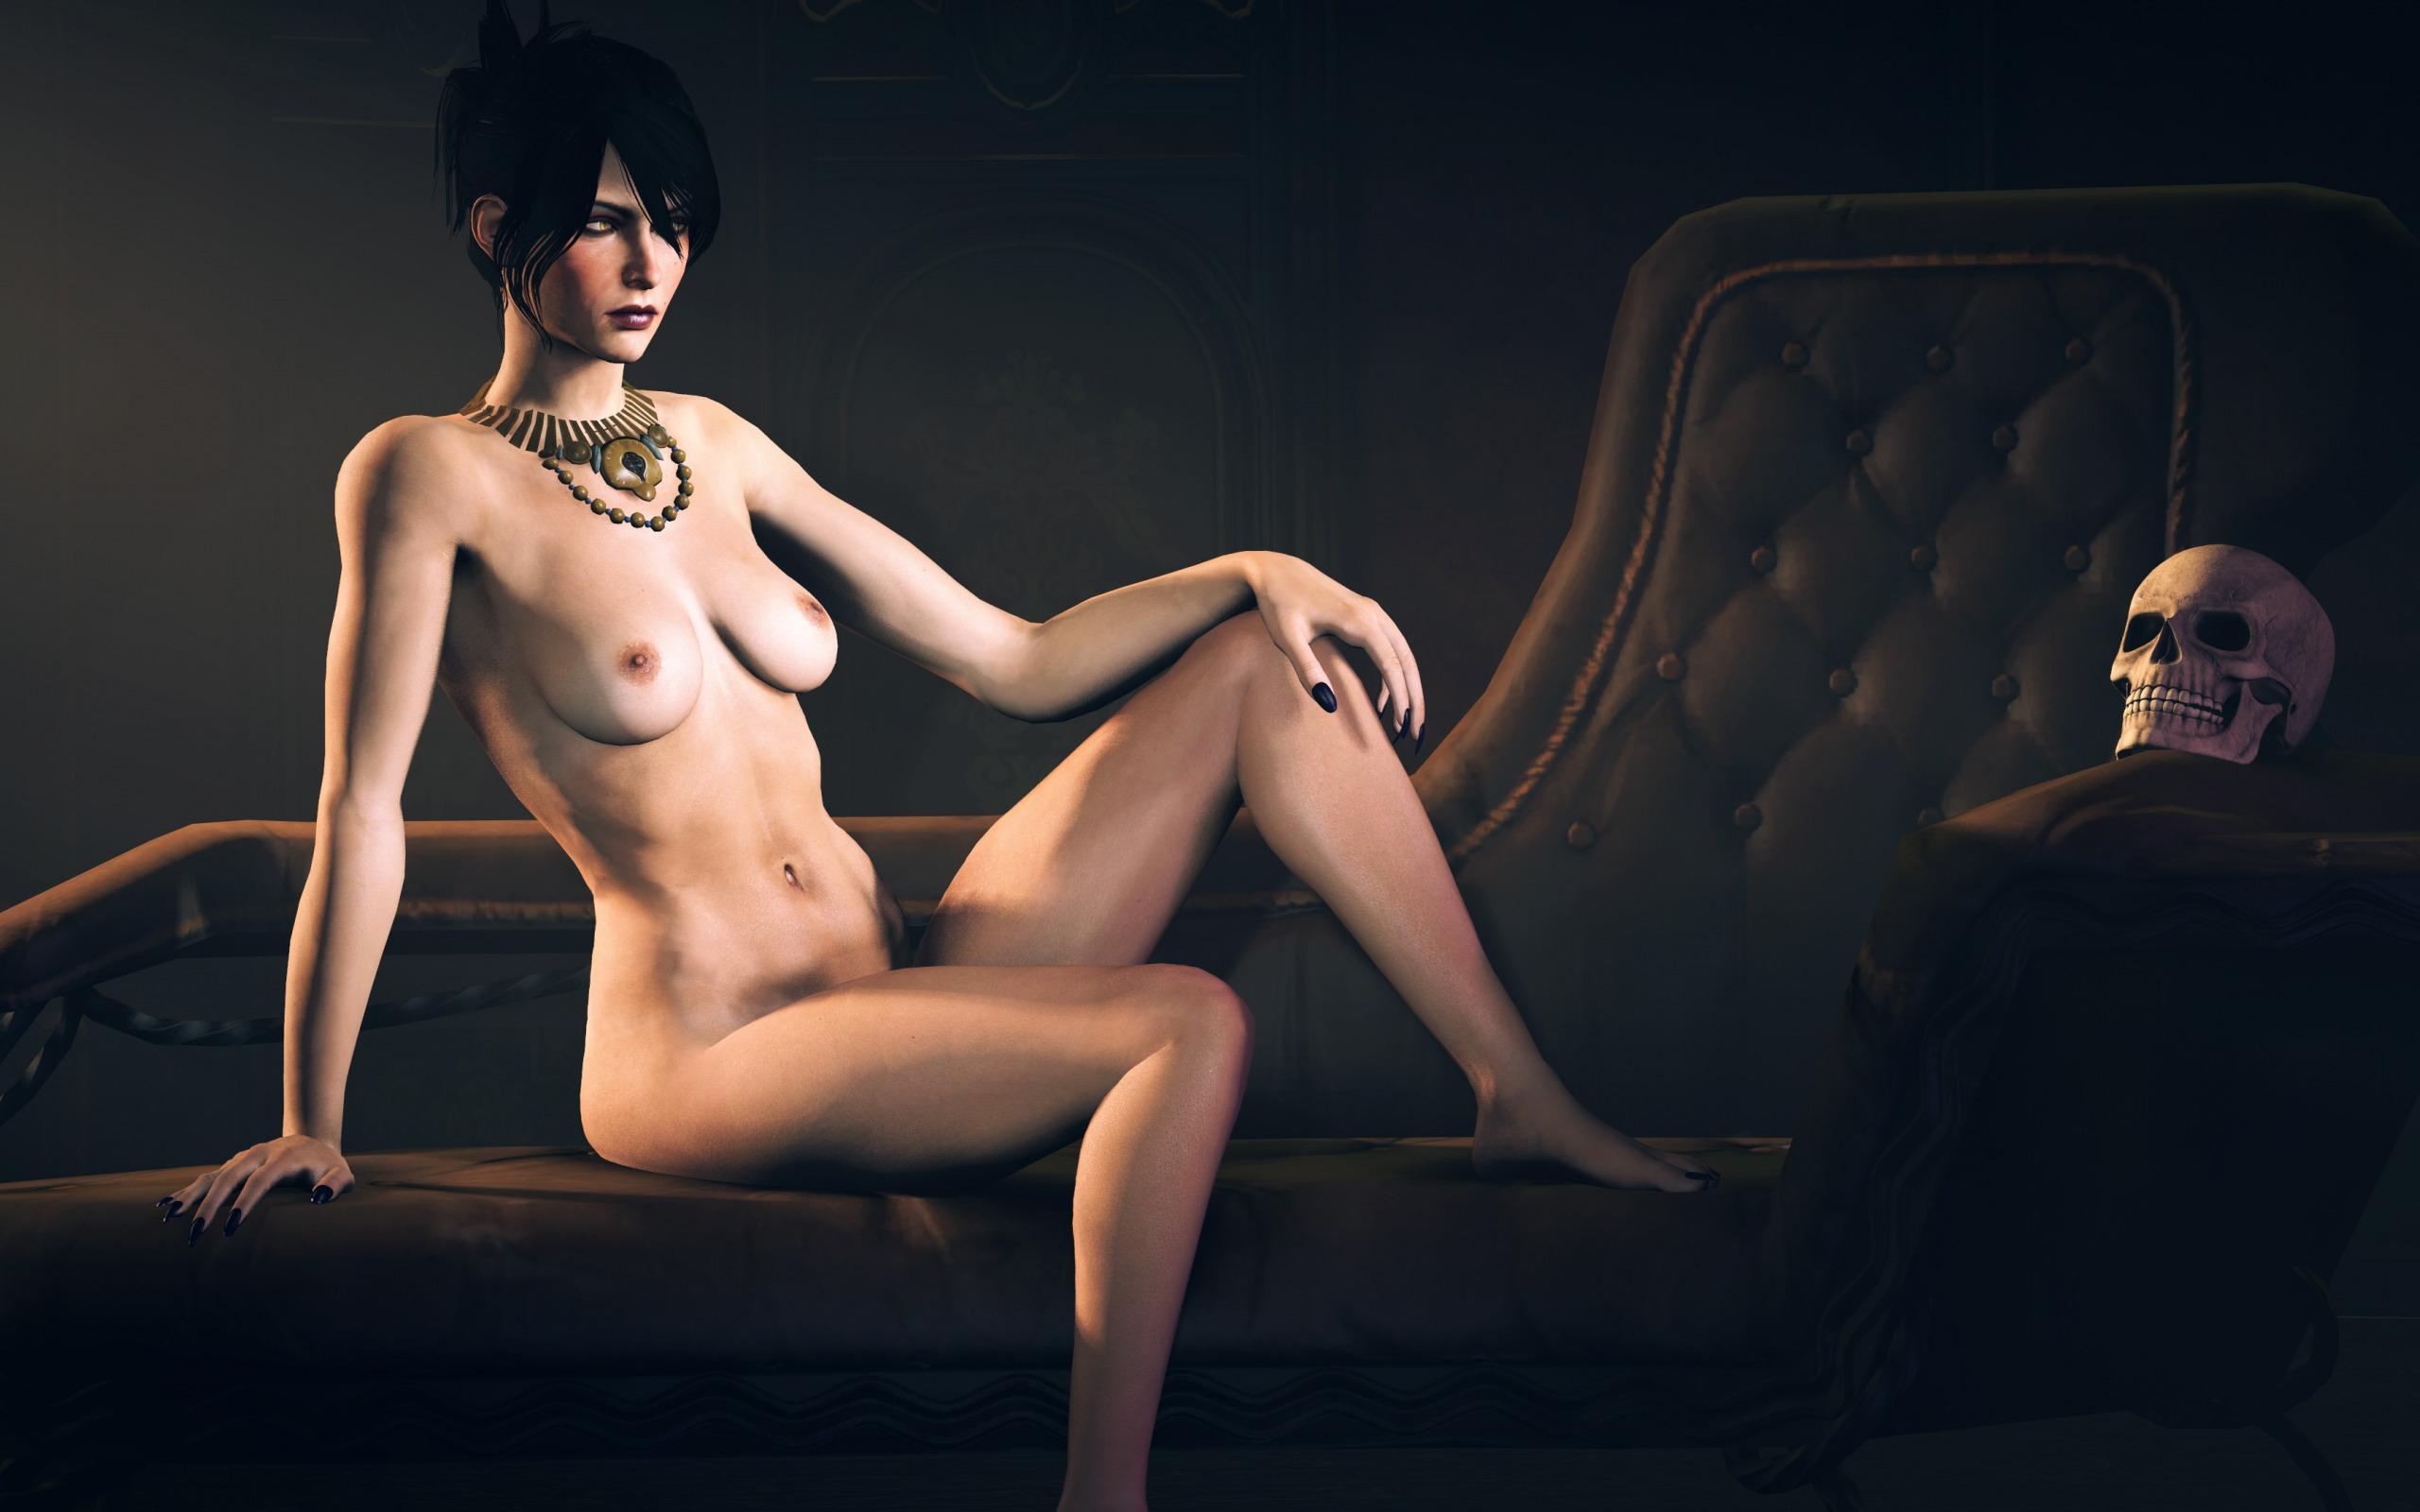 Nude dragon wallpaper nude video